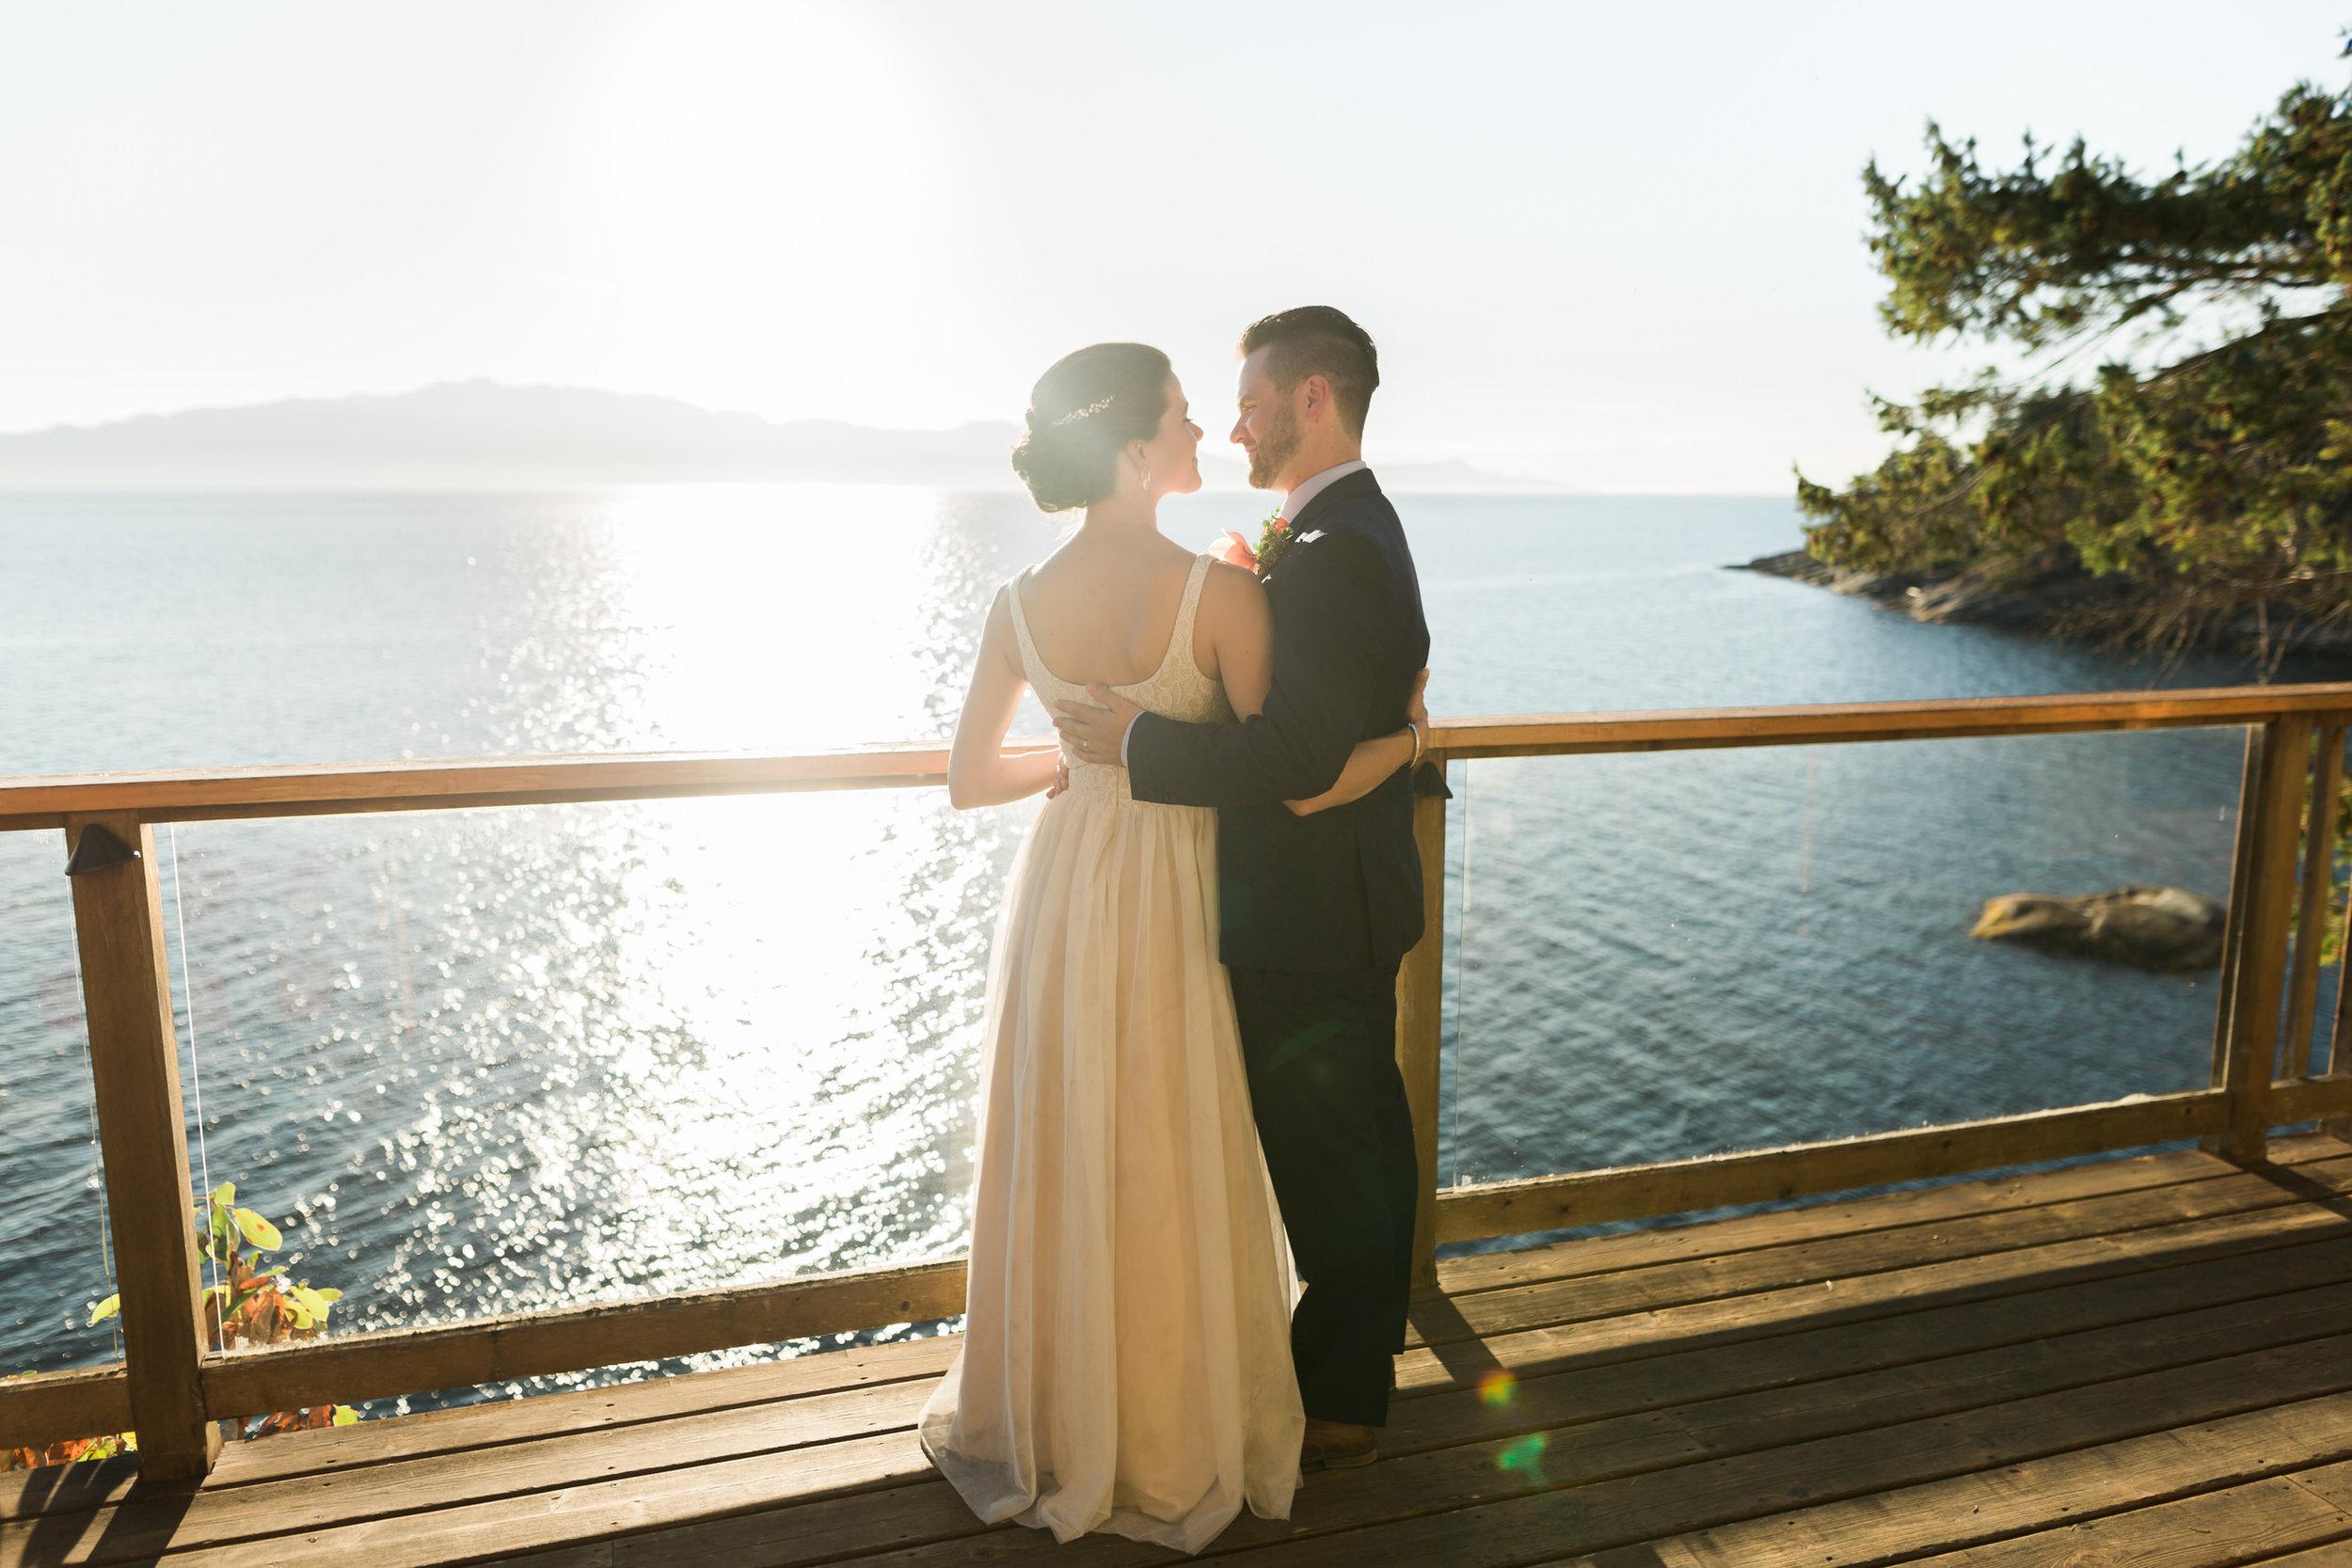 Rockwater Secret Cove Resort Wedding - Sunshine Coast BC Wedding Photographer - Vancouver Wedding Photographer - Sunshine Coast Elopement Photos - IMG_0699.jpg